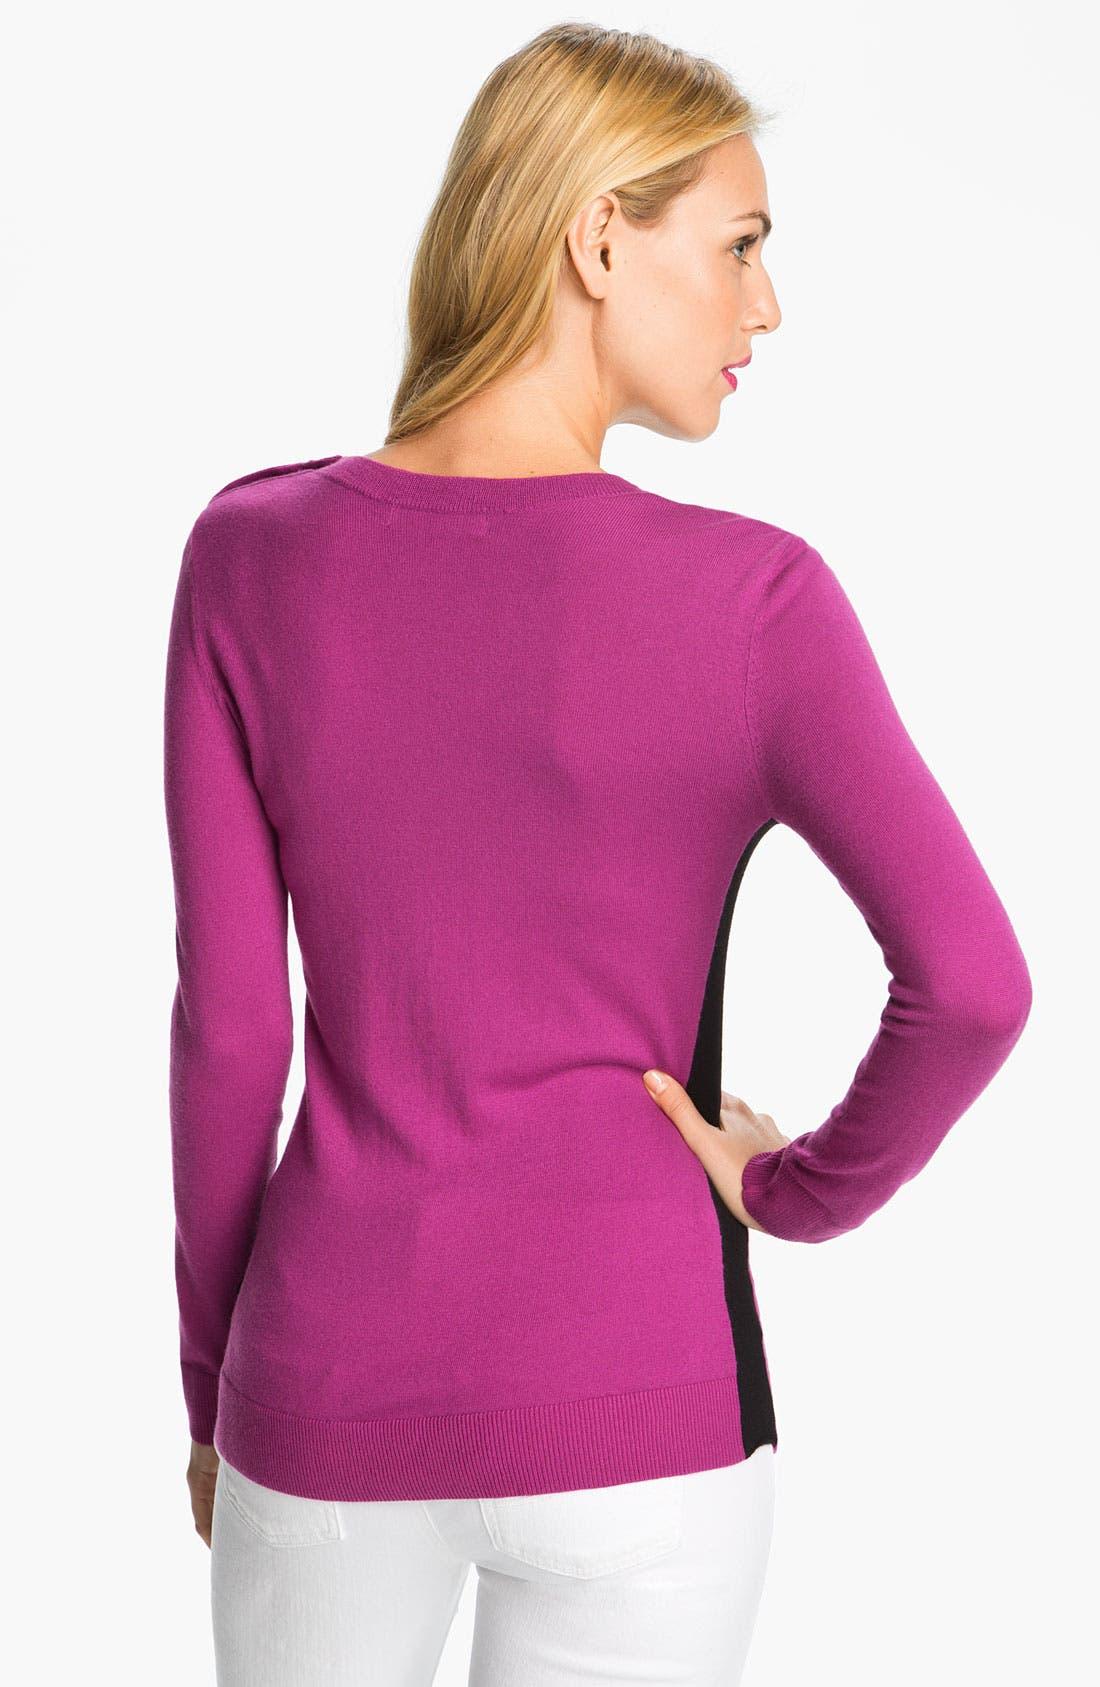 Alternate Image 2  - MICHAEL Michael Kors Colorblock Crewneck Sweater (Petite)